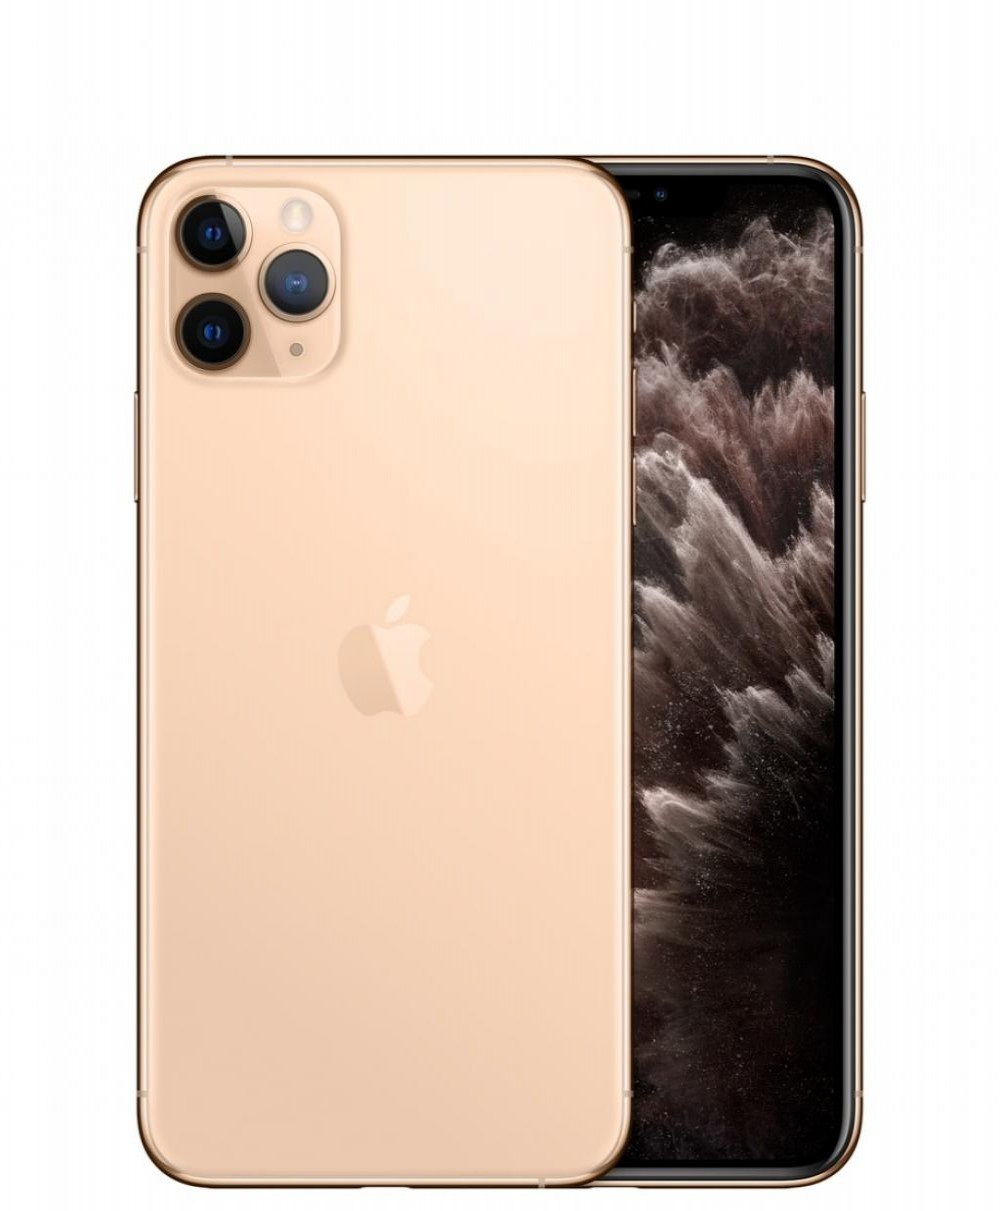 Celular Apple Iphone 11 Pro Max 256GB A2218 Gold BZ